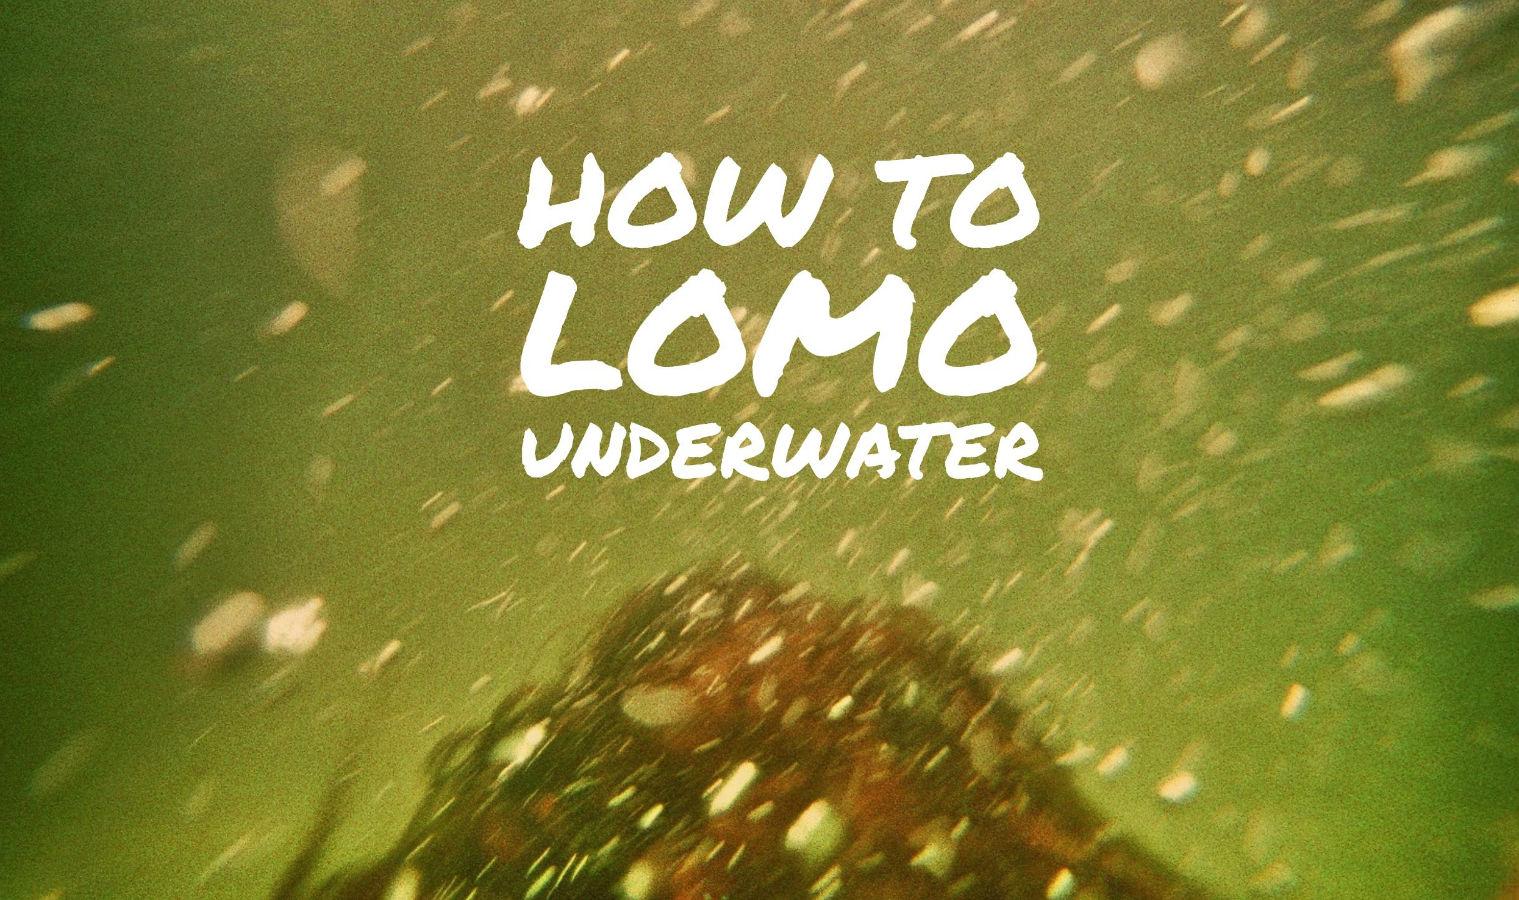 Underwater Lomography Krab analog X-Pro Lomoherz